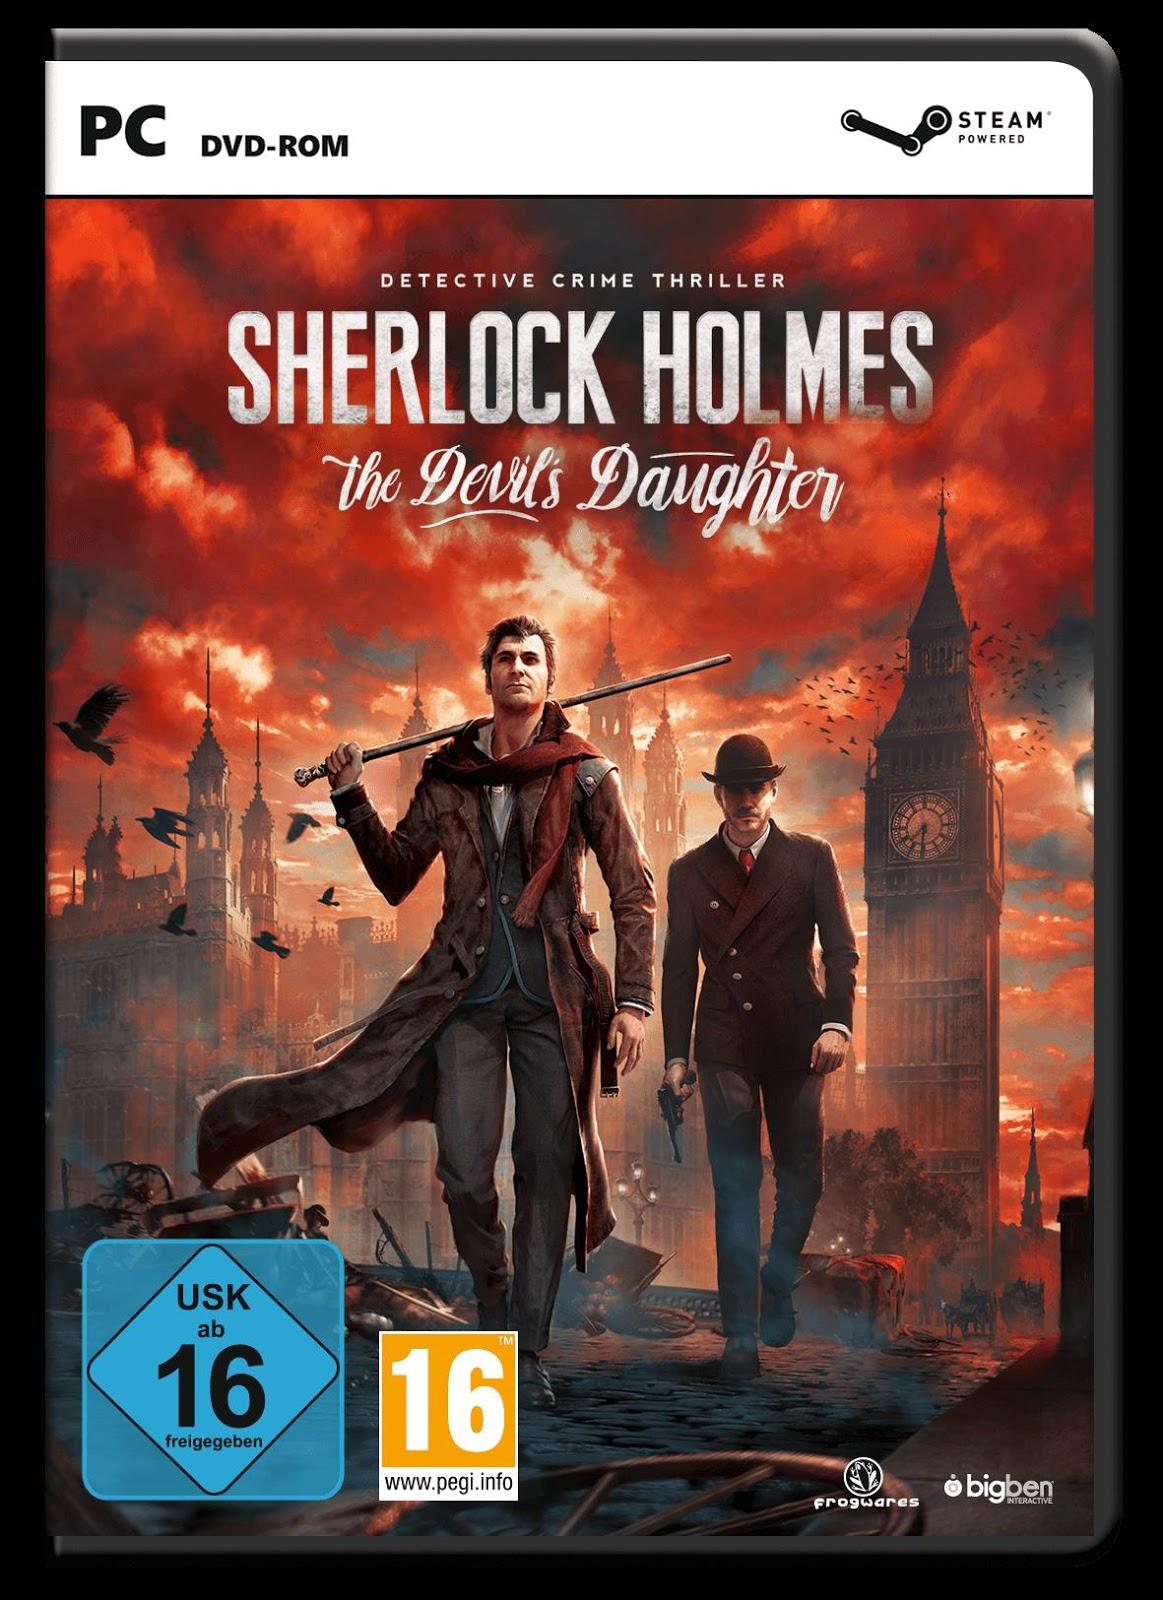 Sherlock Holmes: The Devil's Daughter (Region Free) PC PS4 PC Xbox360 PS3 Wii Nintendo Mac Linux